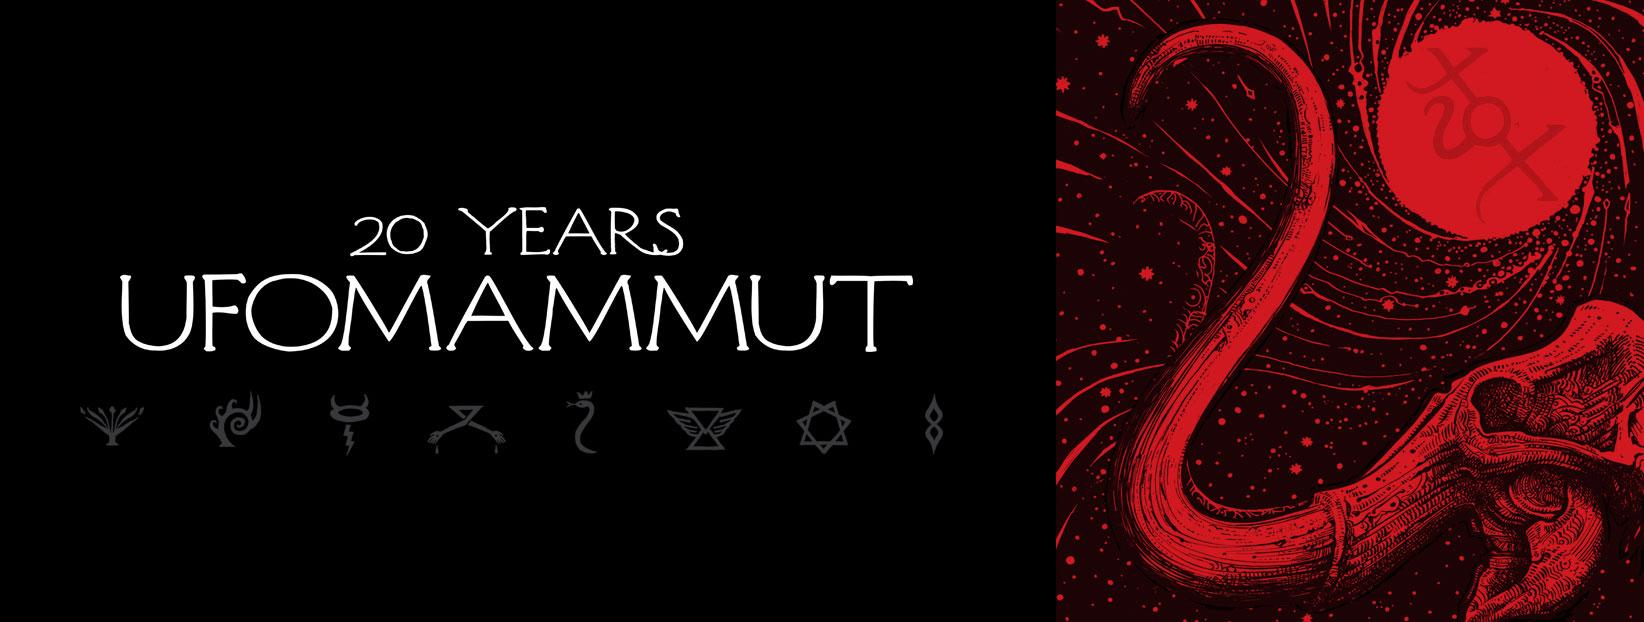 ufomammut 20 years banner